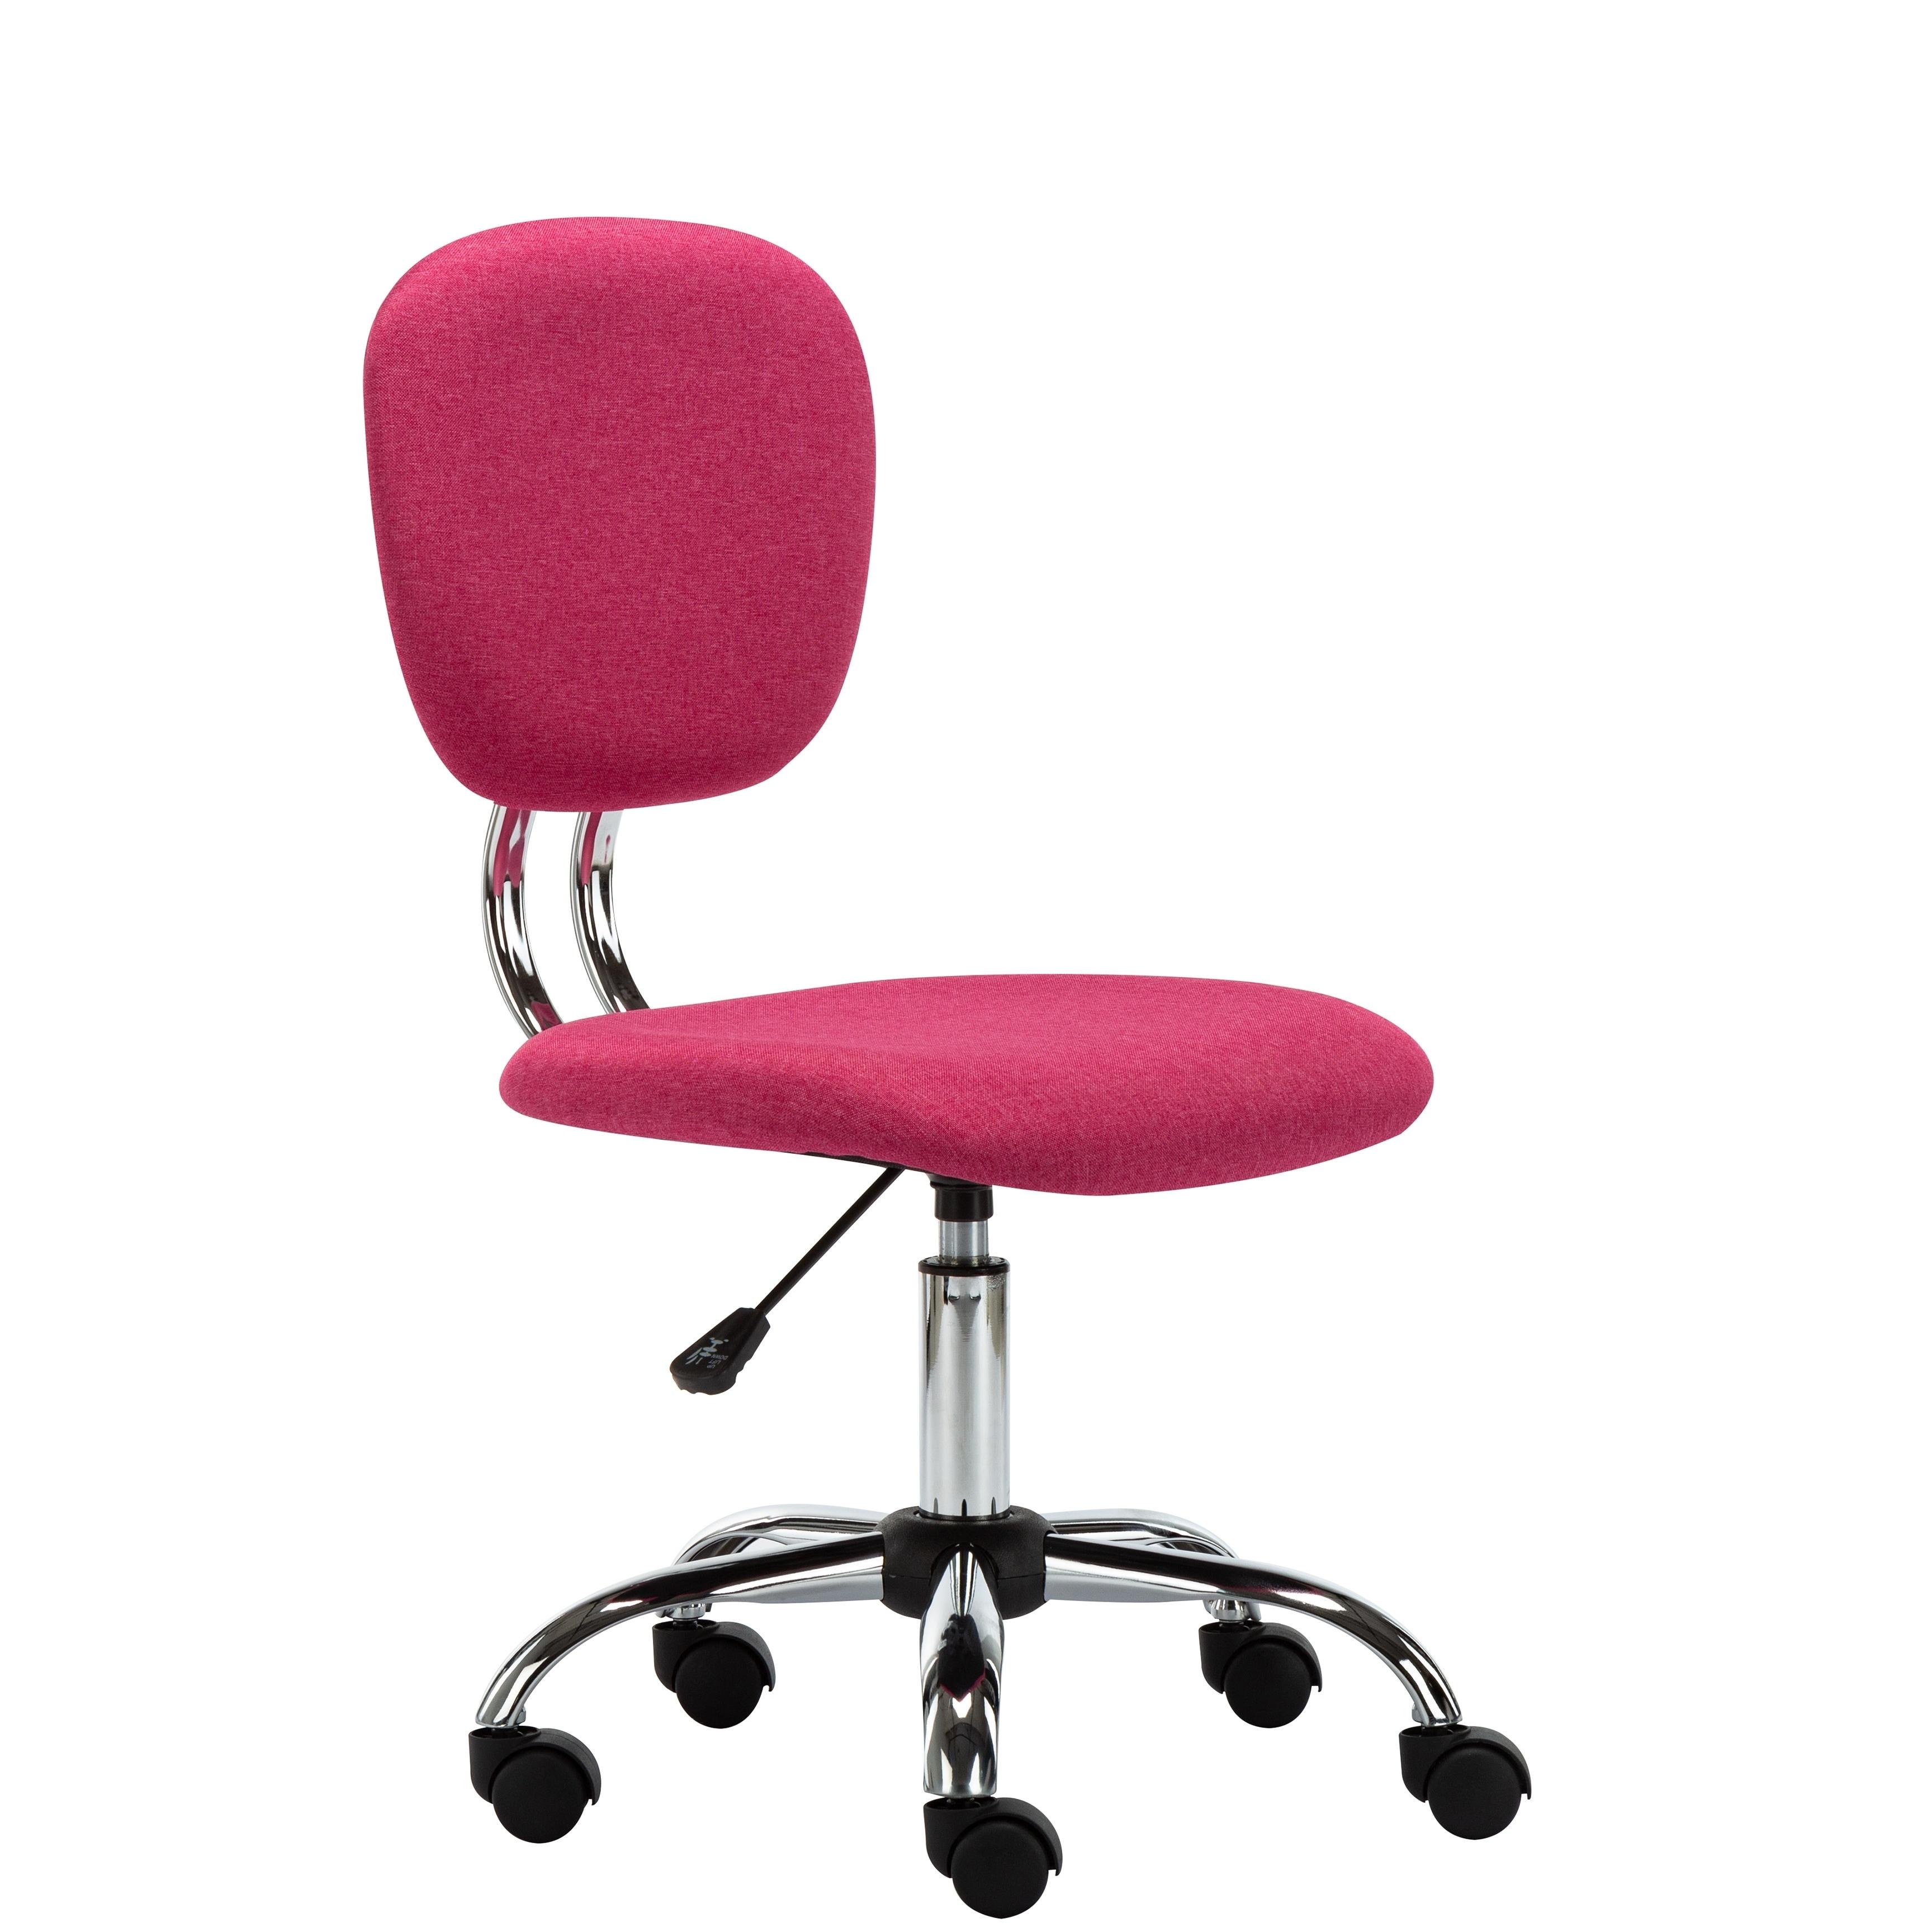 Porthos Home Office Chair Premium Quality Designer Office